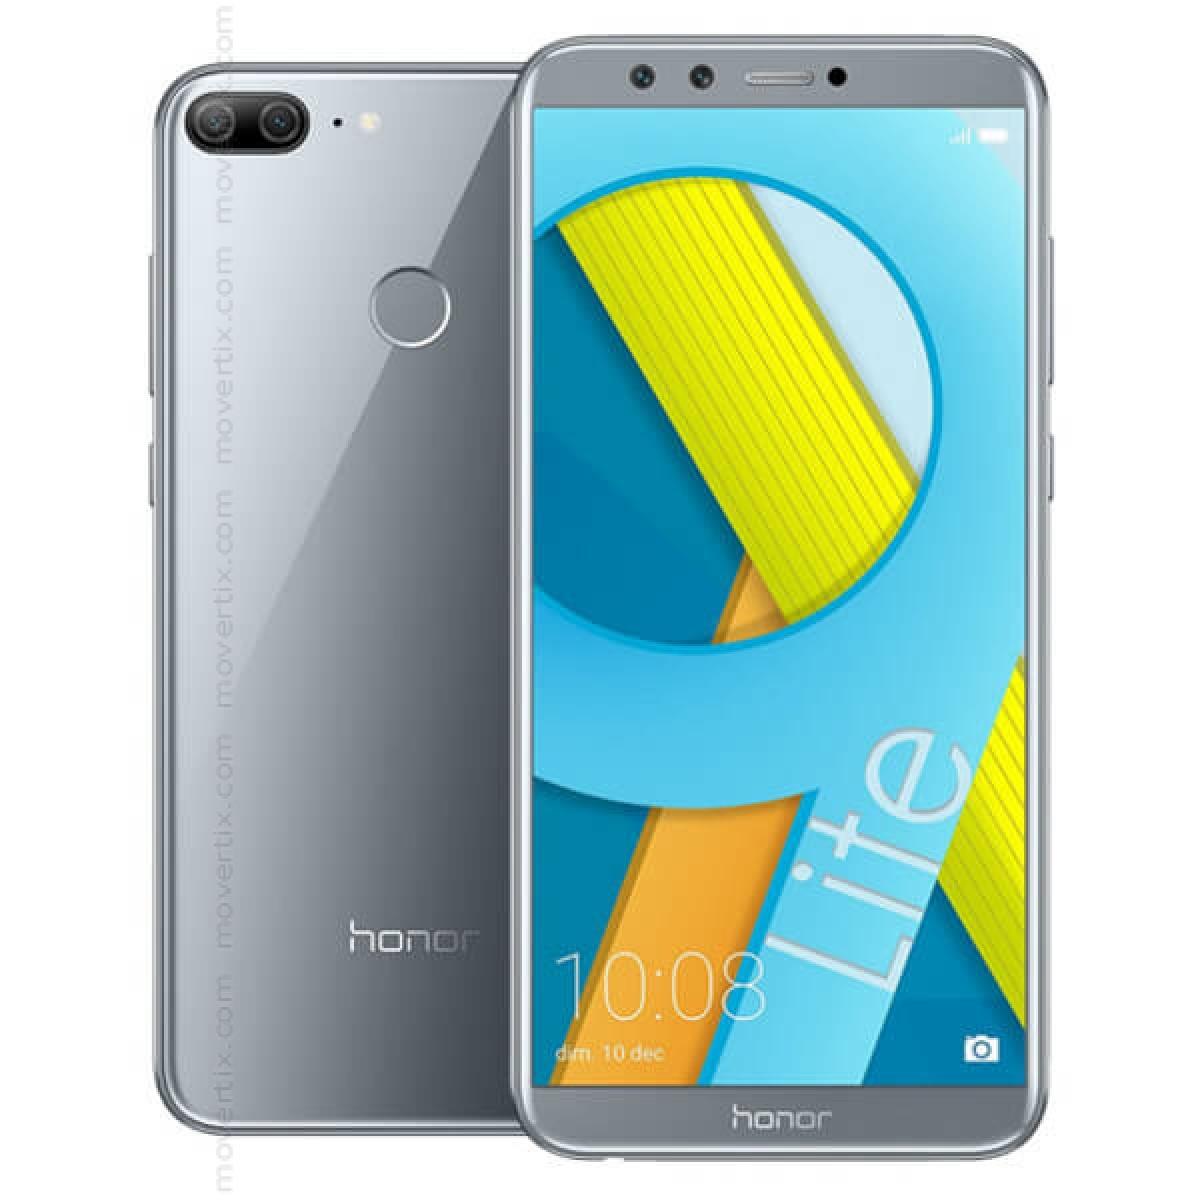 Honor 9 Lite Dual SIM Grey 32GB and 3GB RAM